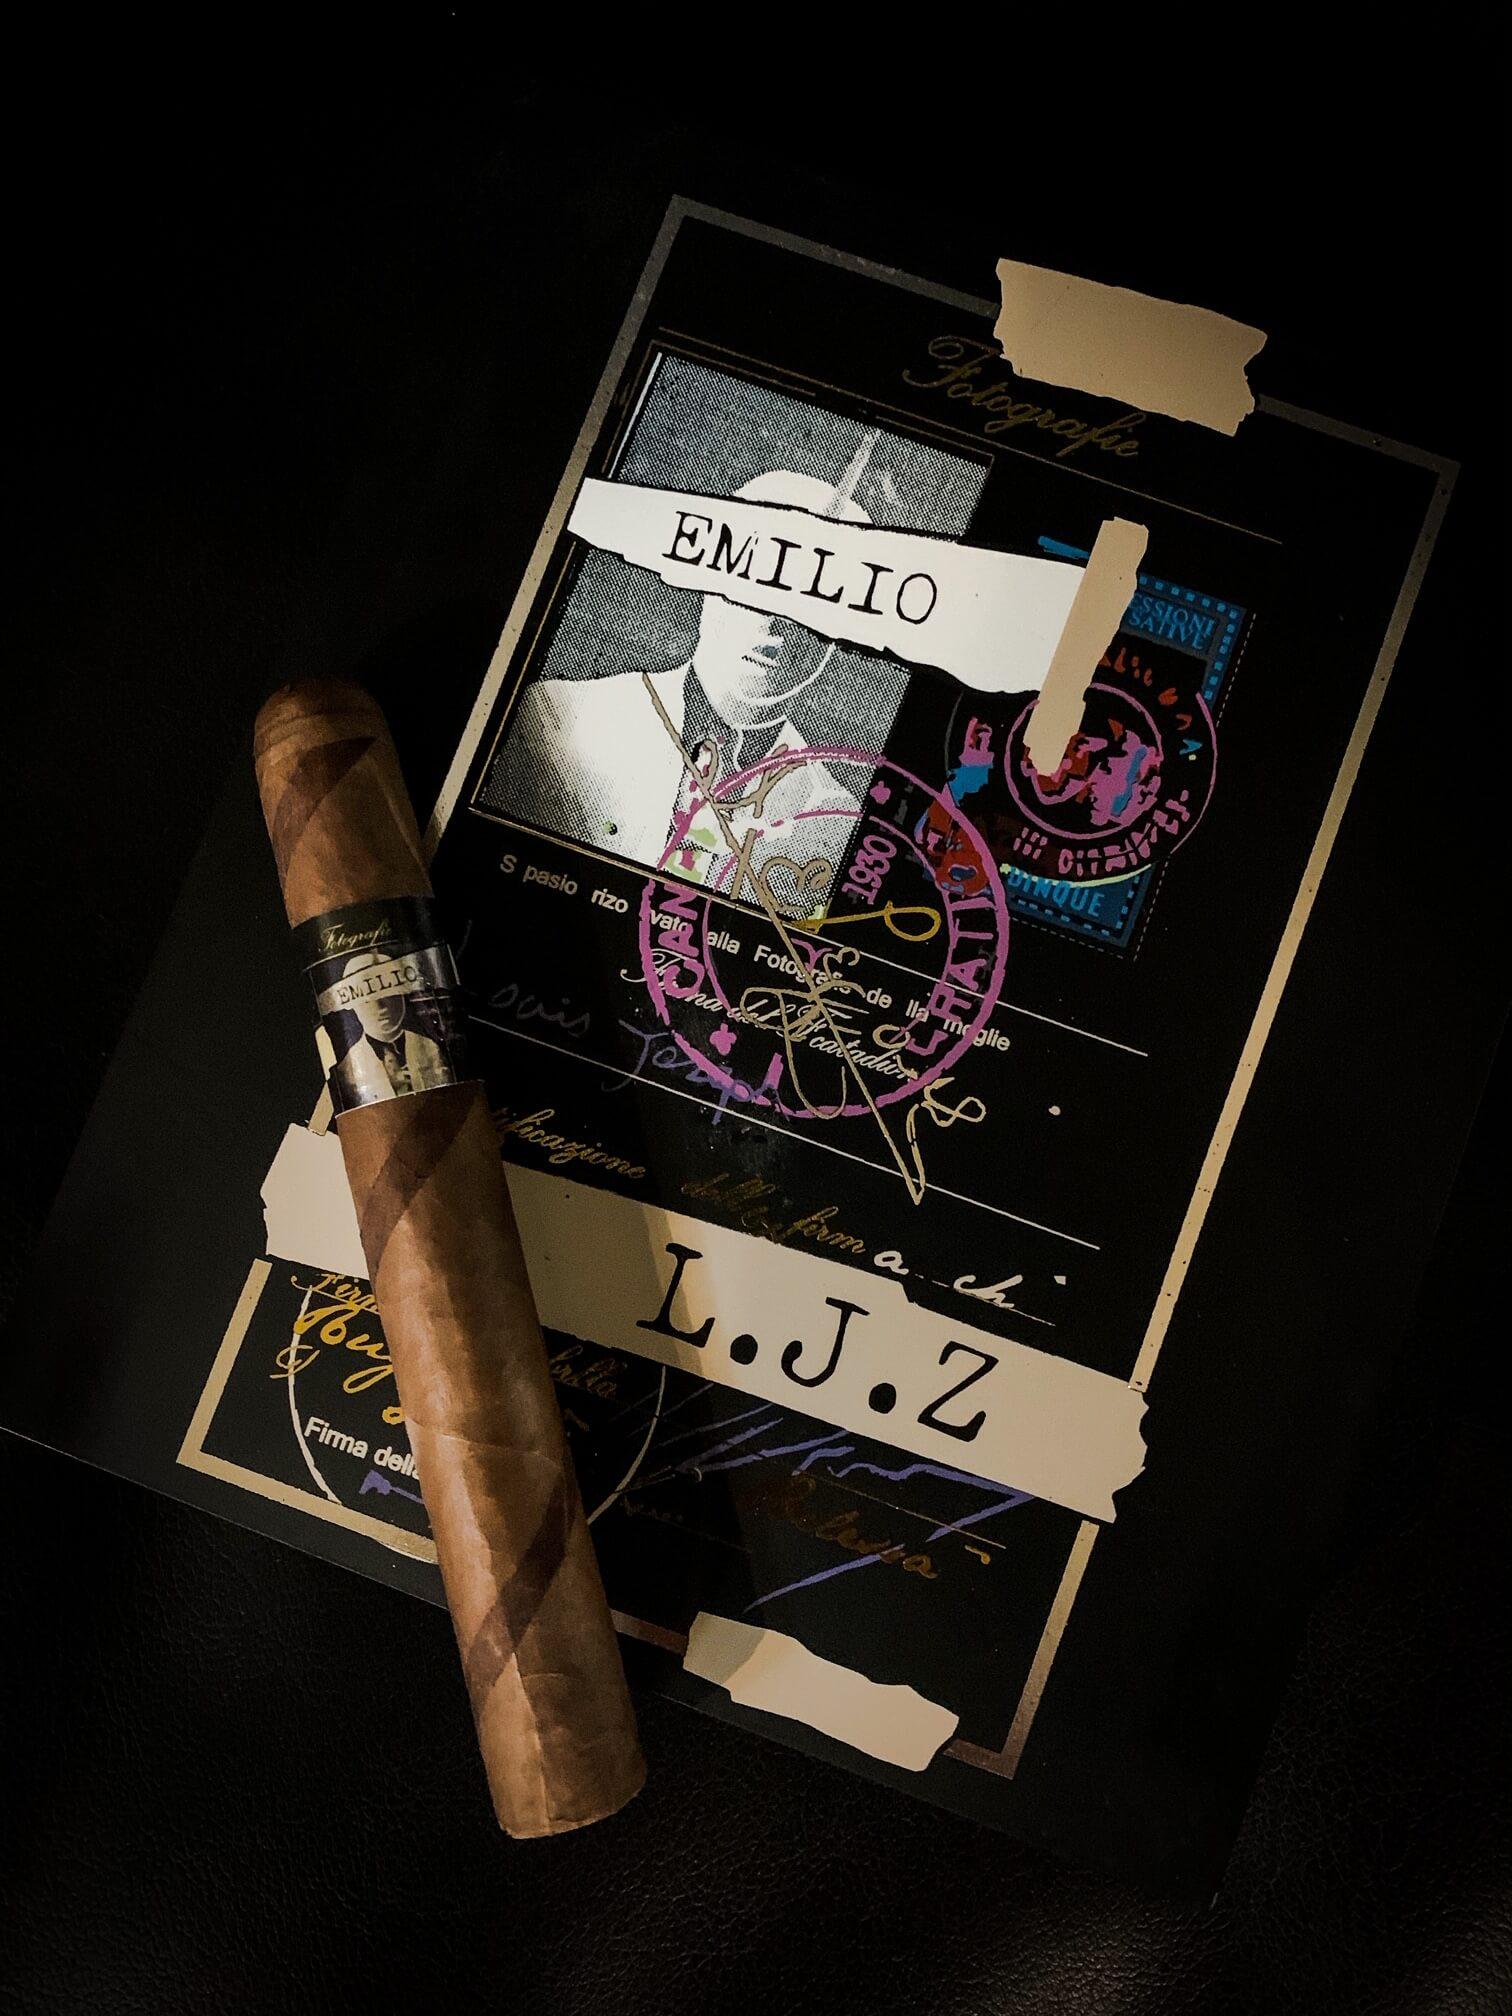 Cigar News: Emilio Cigars Releases Limited Edition LJZ